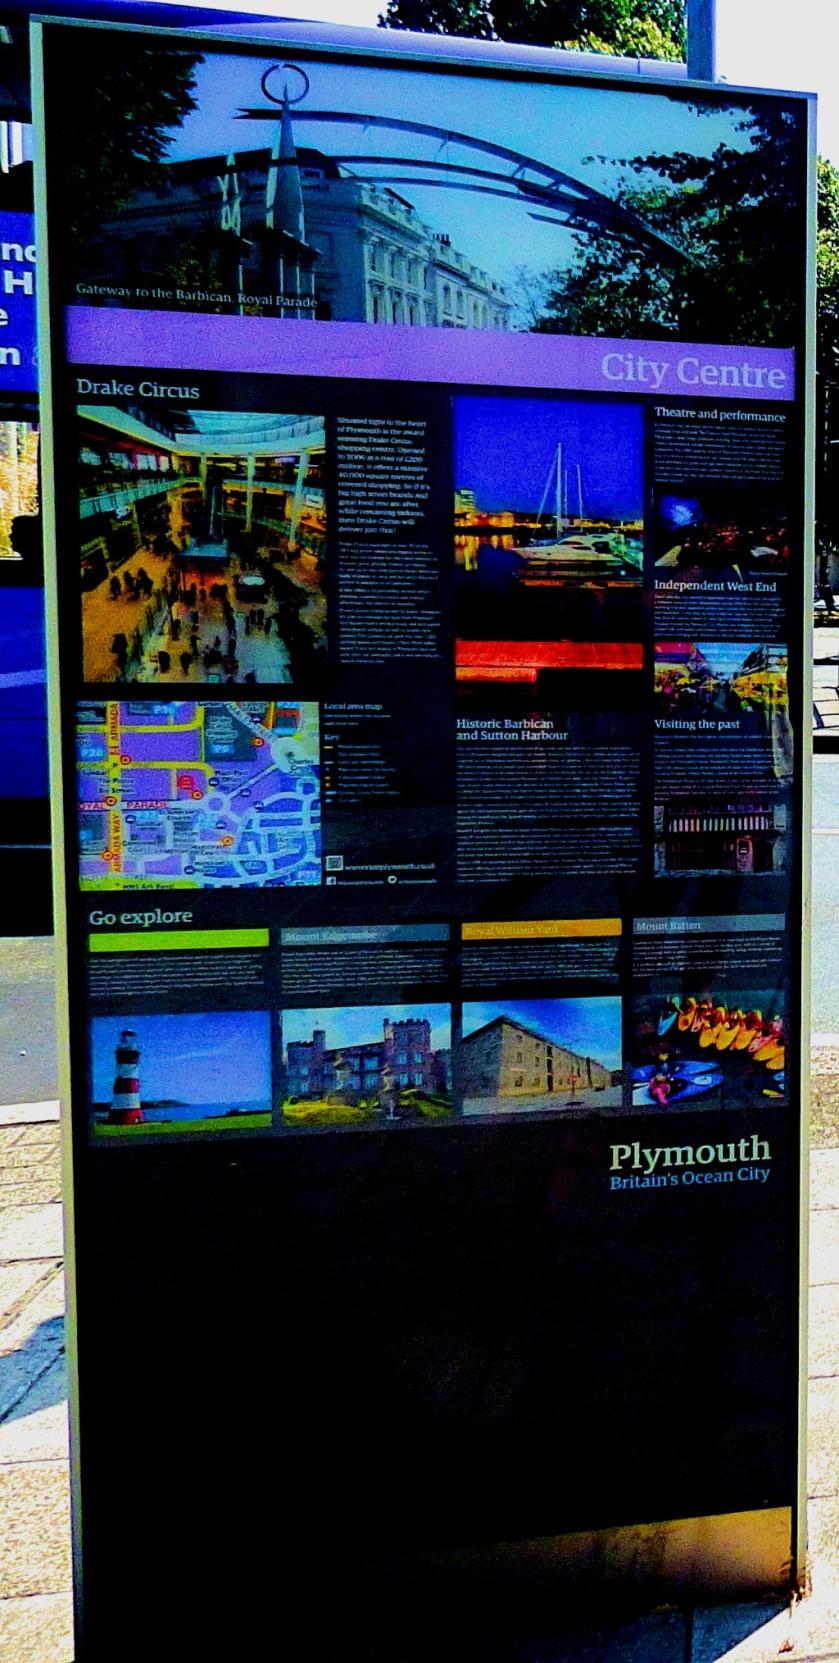 Plymouth - Britain's Ocean City